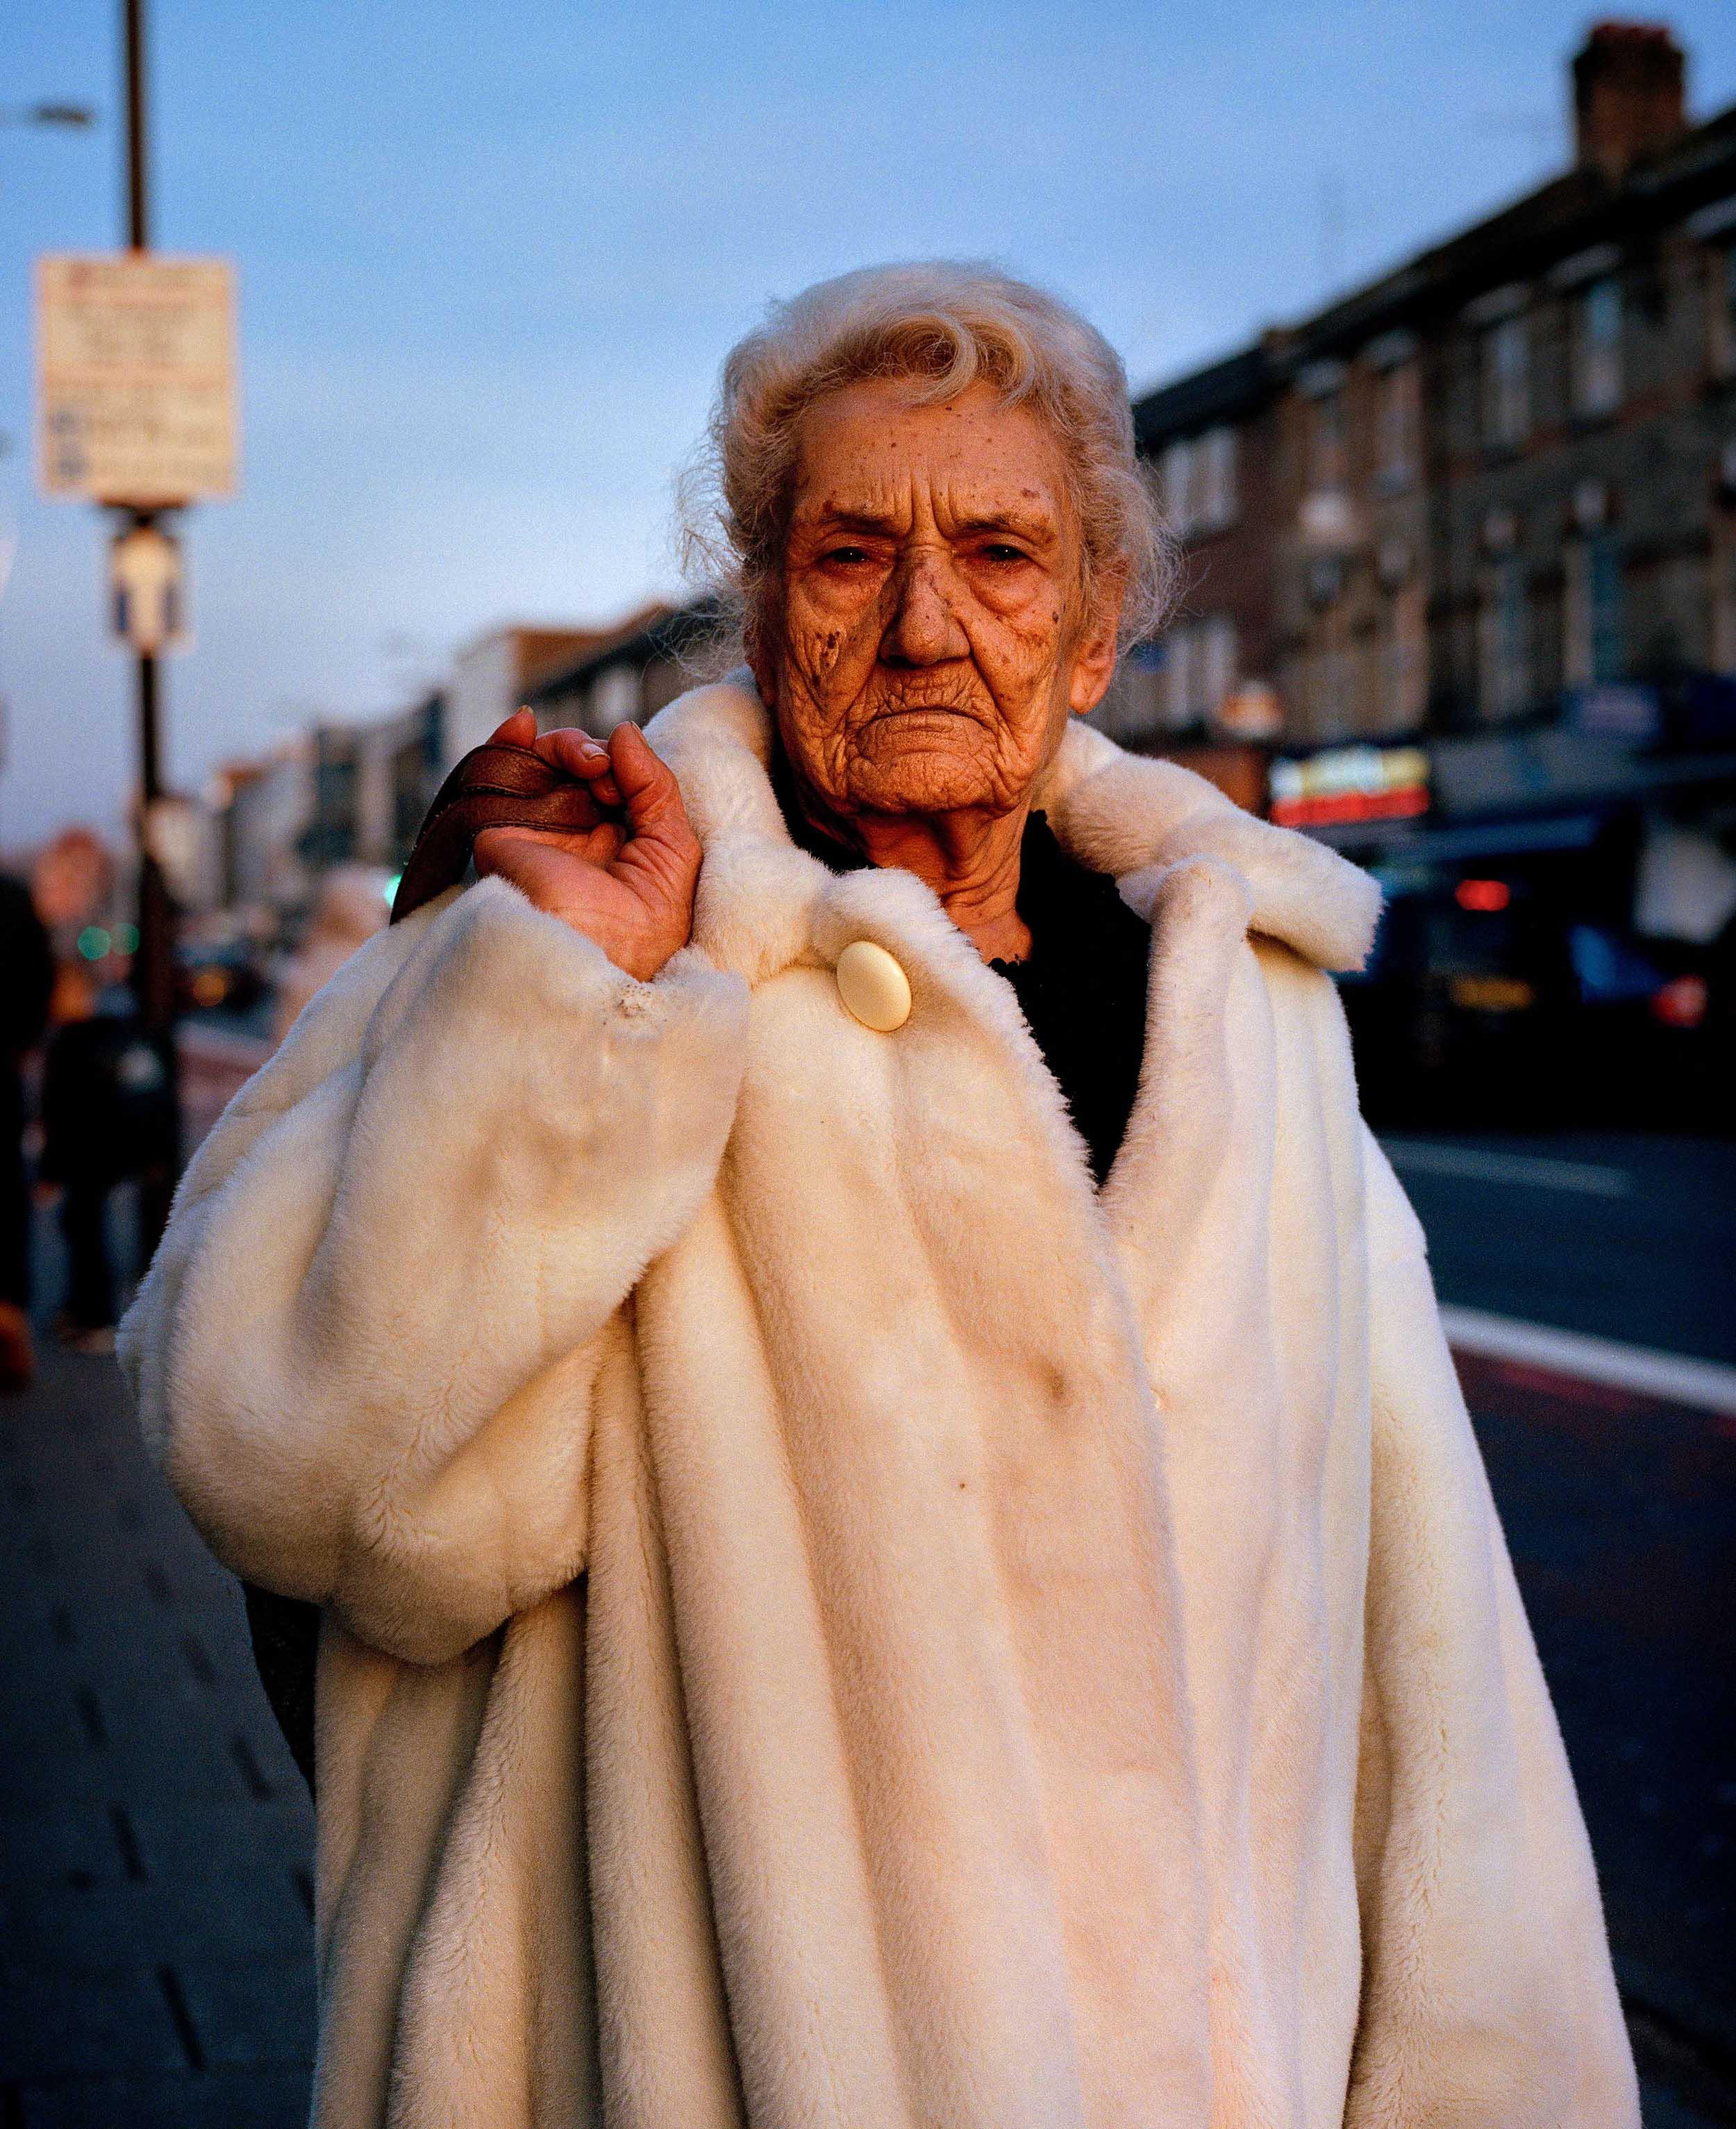 5-blighty-england-london-sam-gregg-photography.jpg